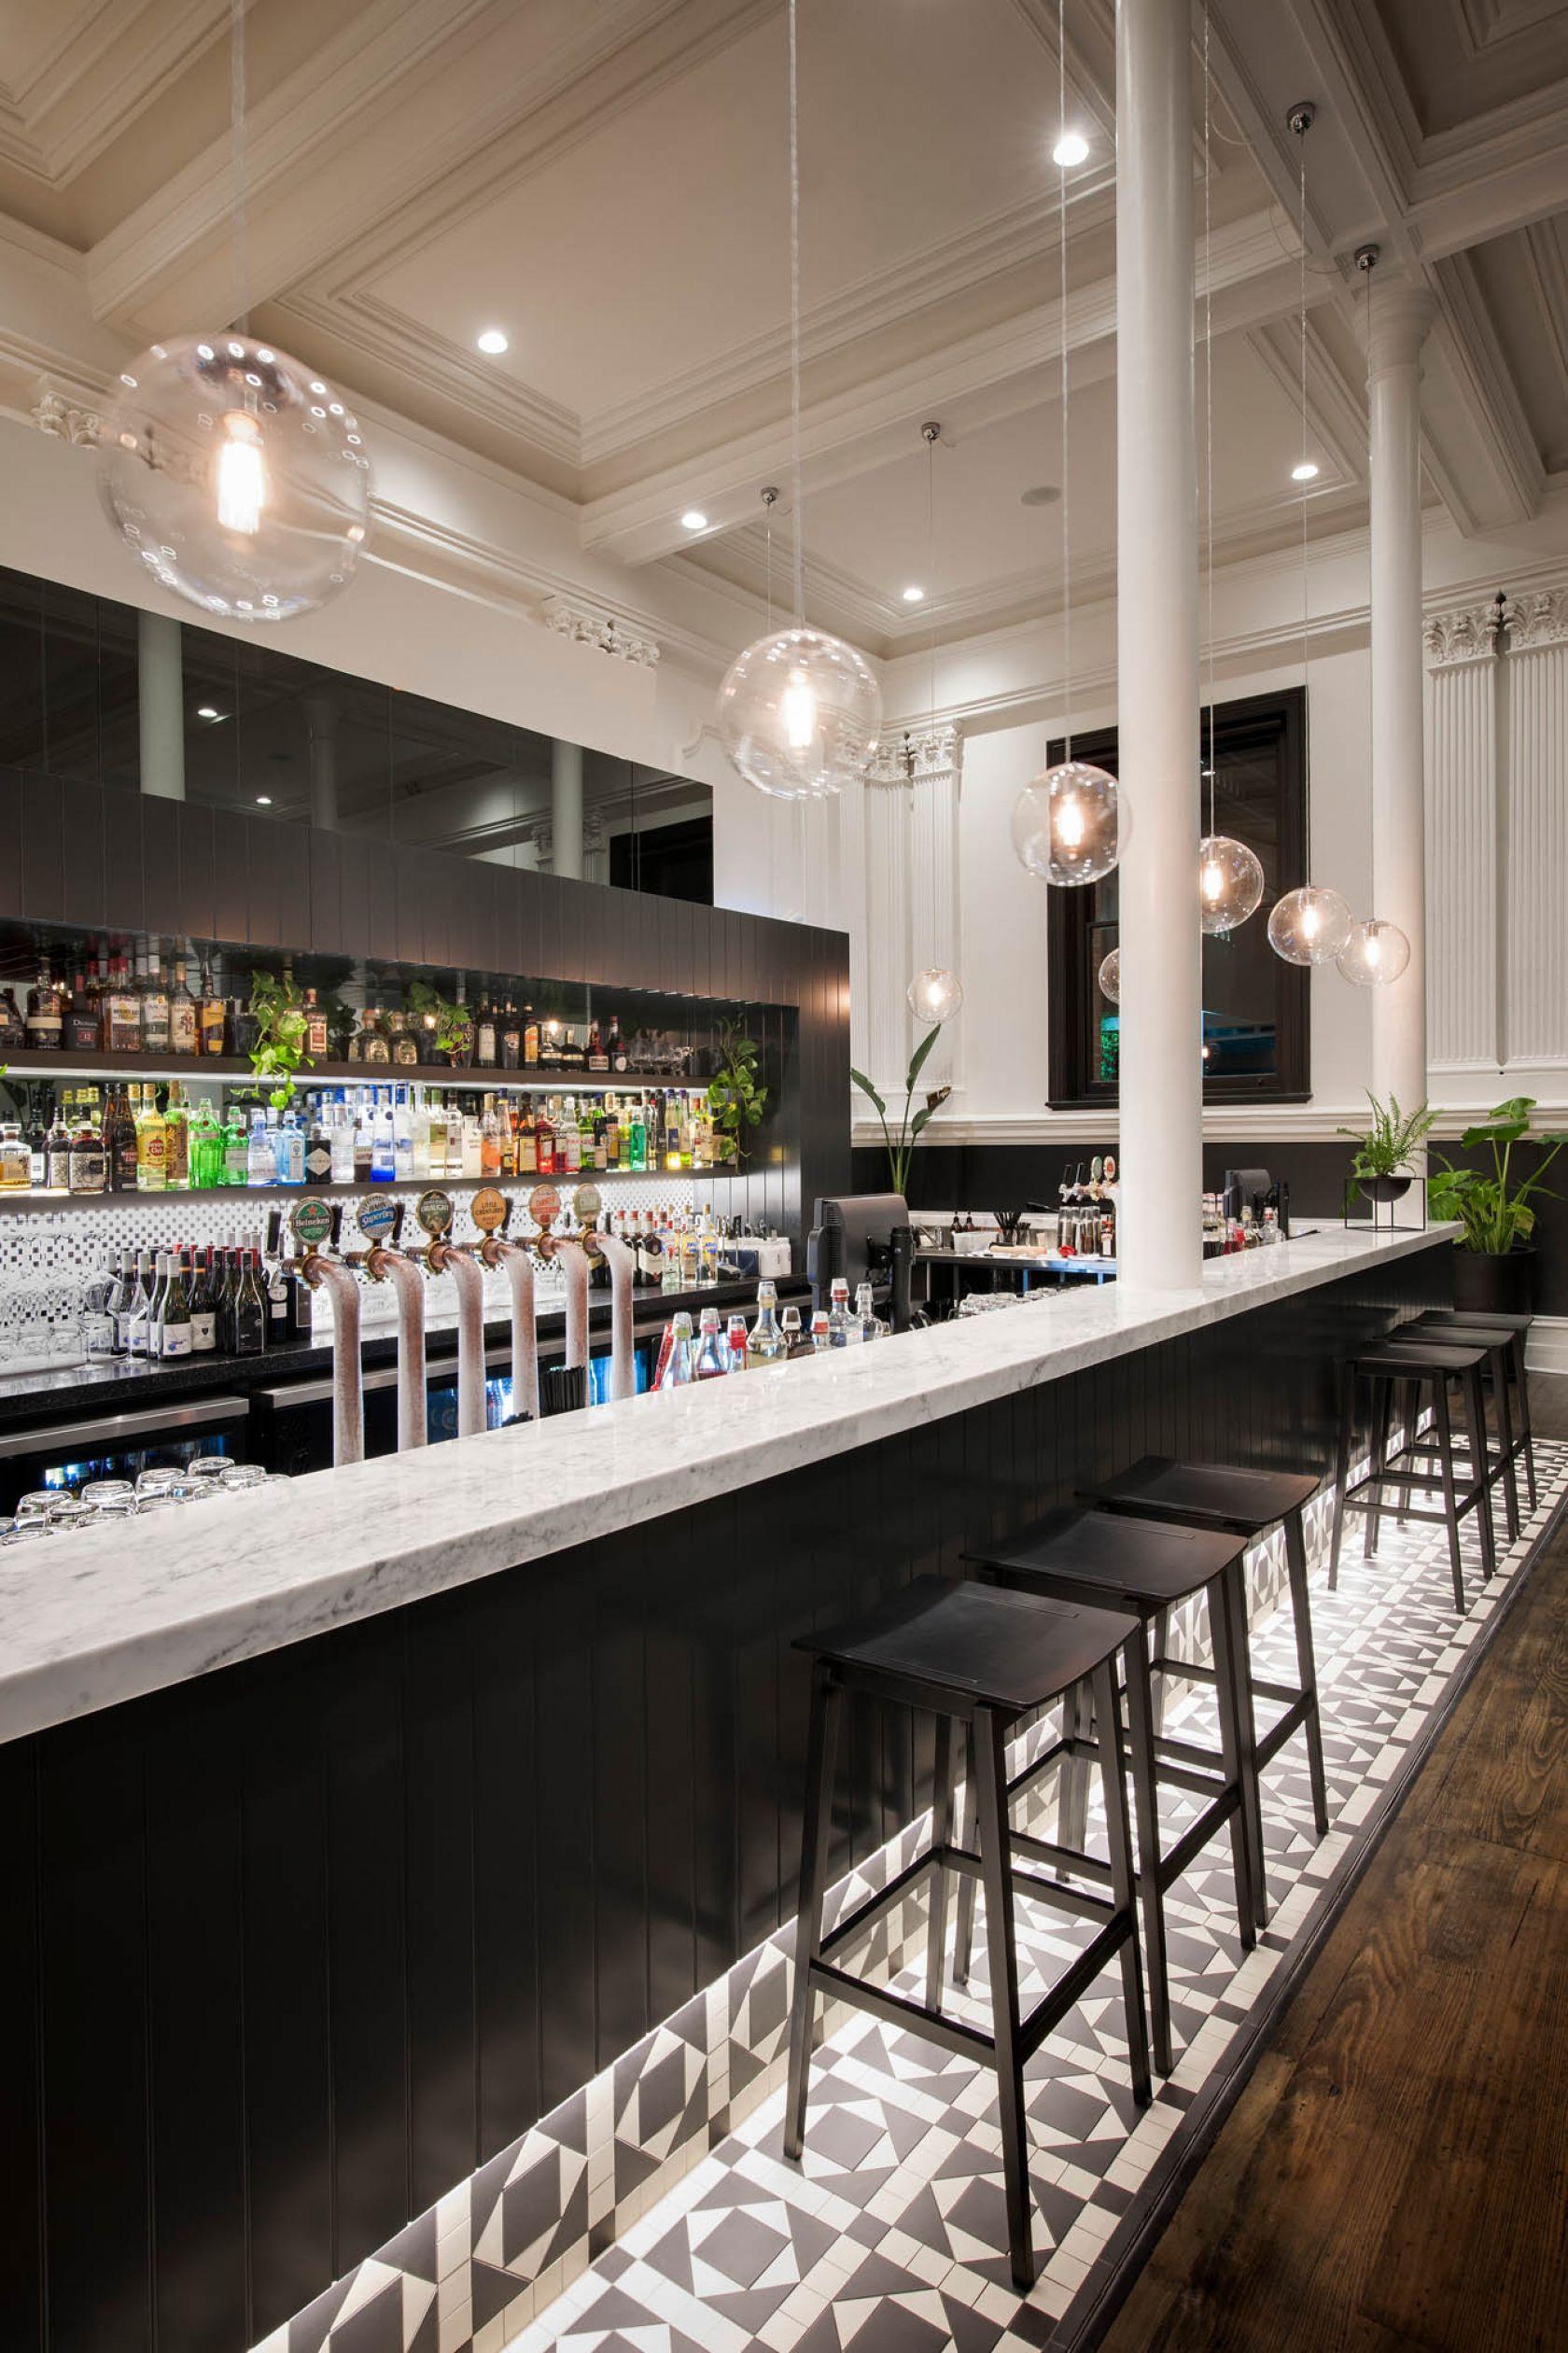 electra house adelaide heritage bar tiles pendant light column coffered ceiling